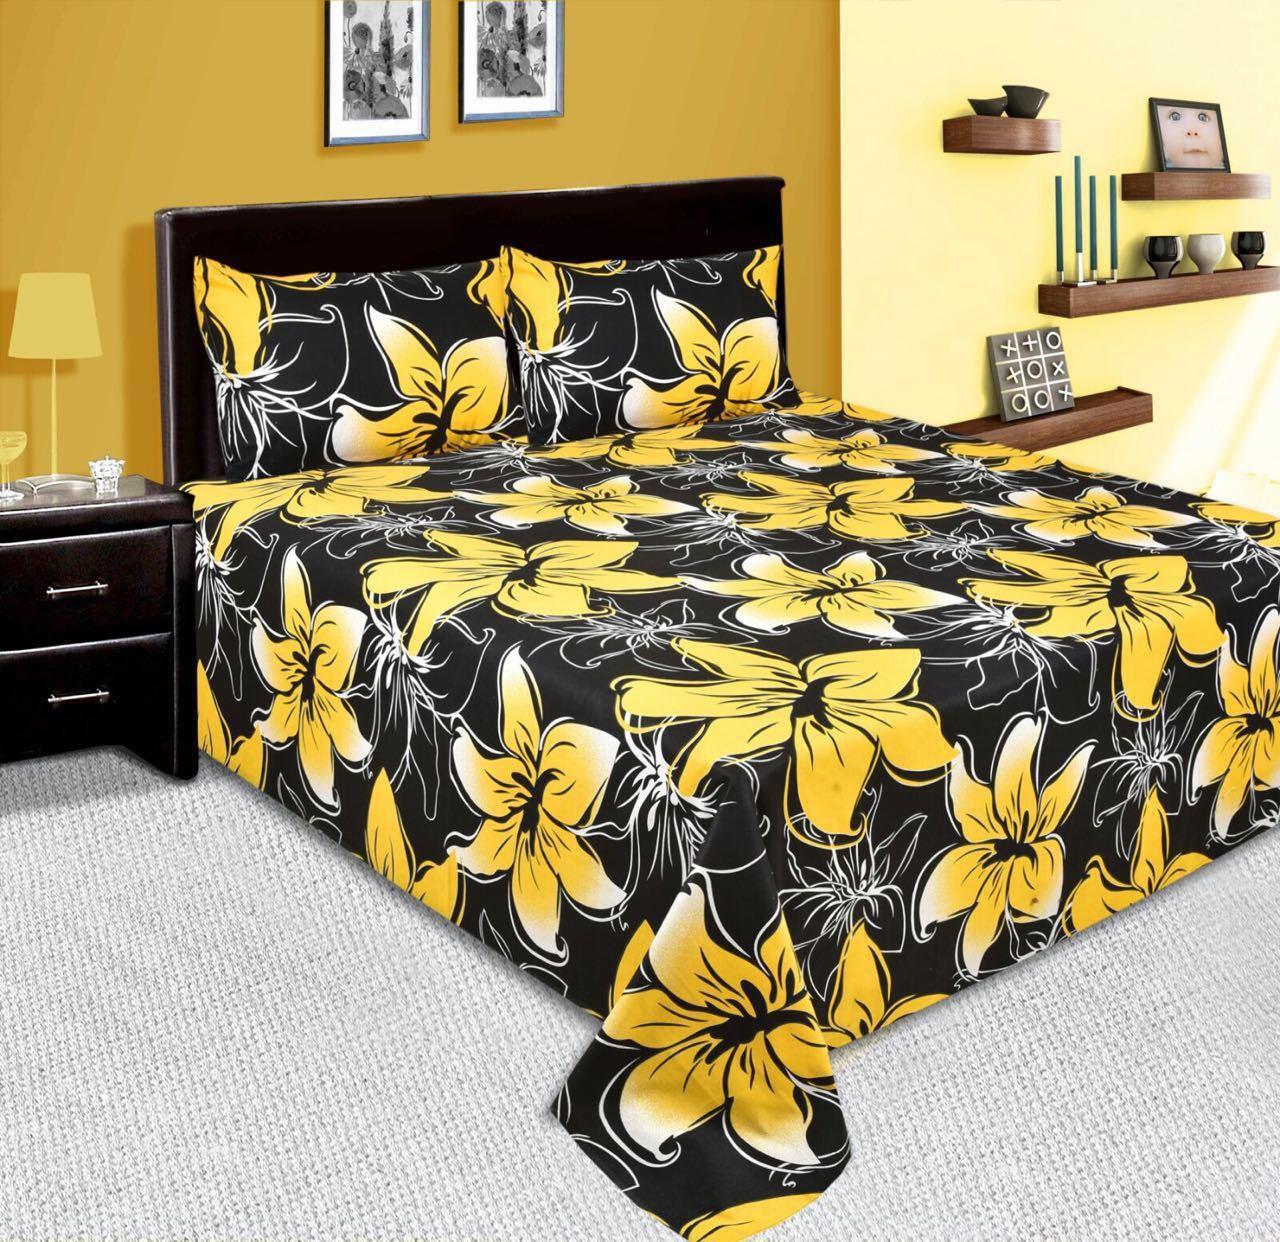 Zain Cotton Floral Queen sized Double Bedsheet(1 QUEEN SIZE BED SHEET, 2 PILLOW COVERS, MULTI COLOUR)